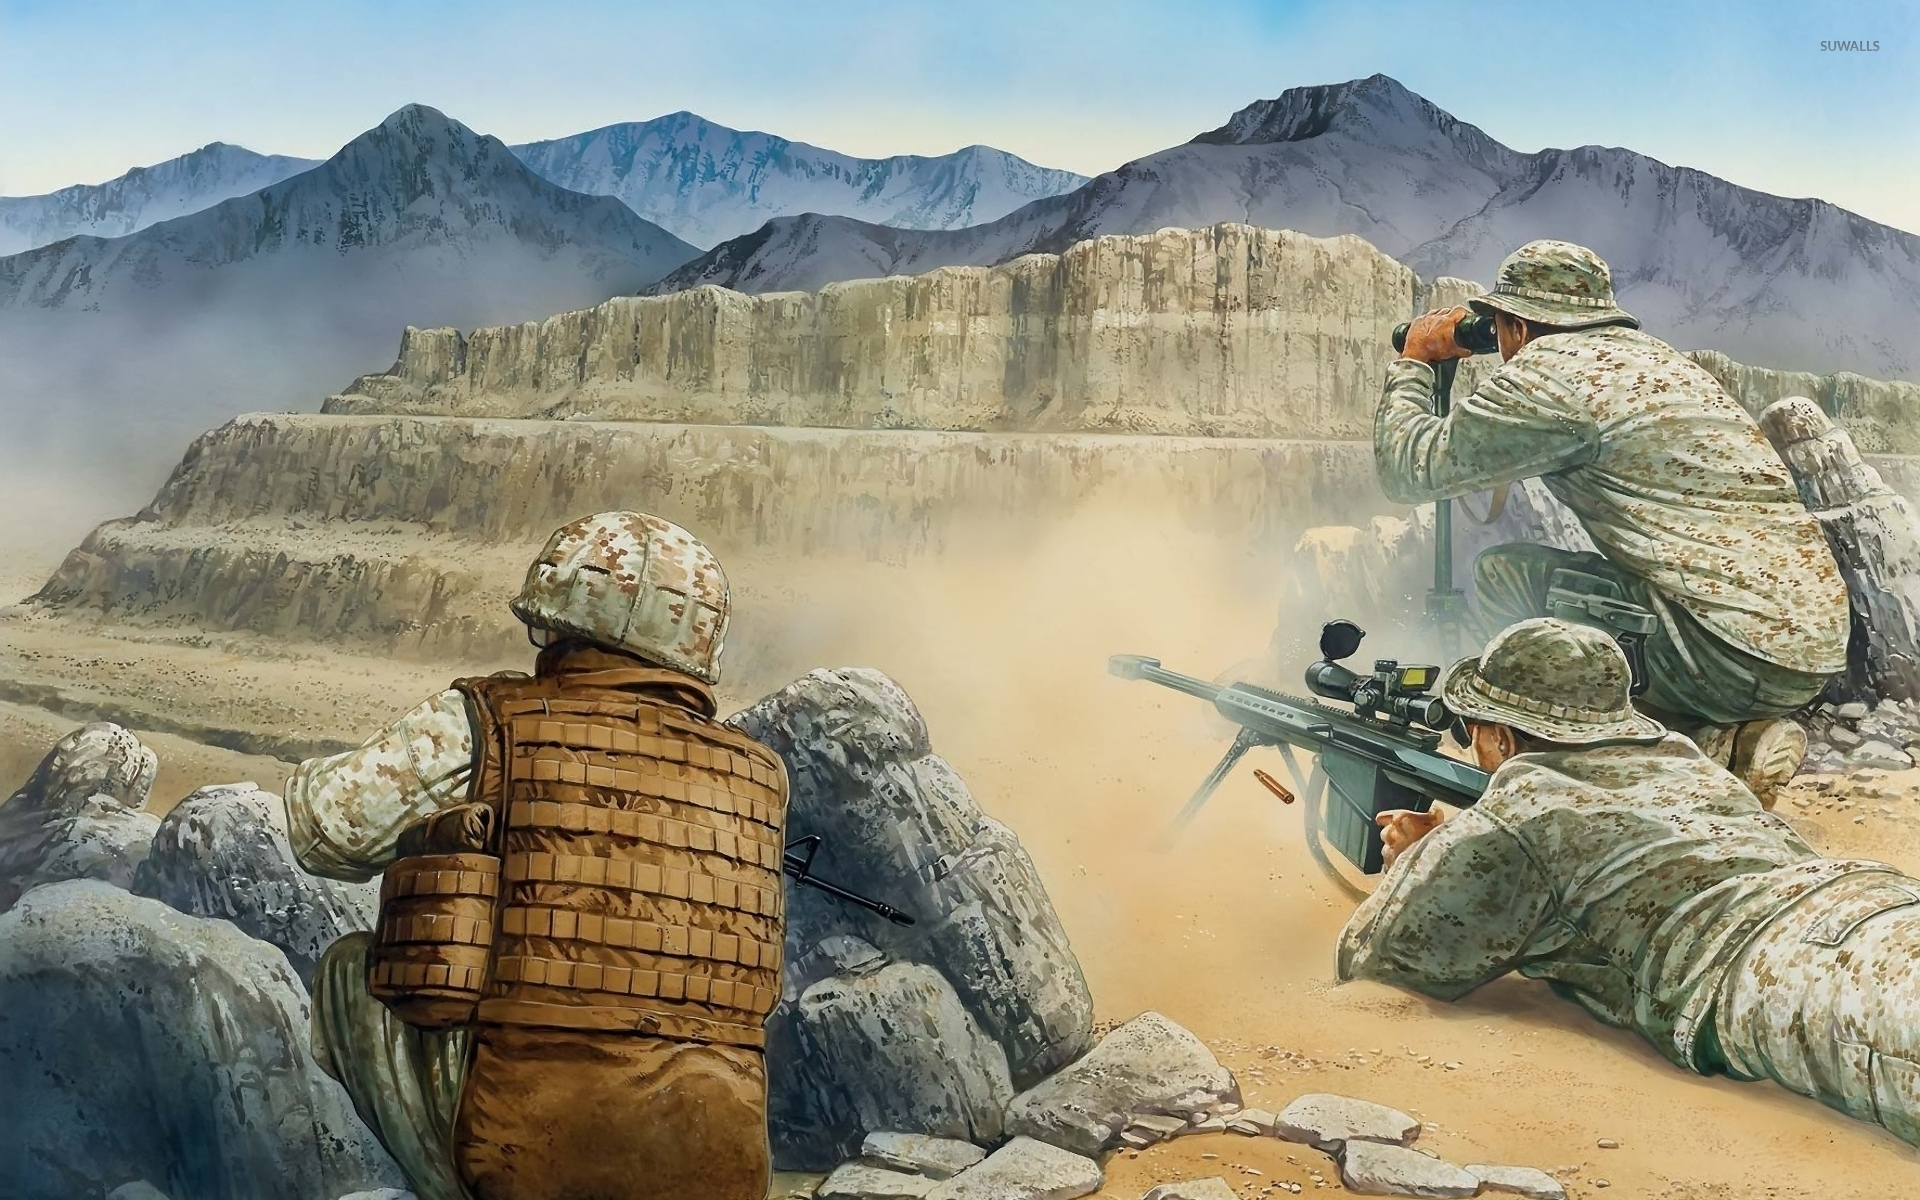 Soldiers at war wallpaper - Digital Art wallpapers - #45936